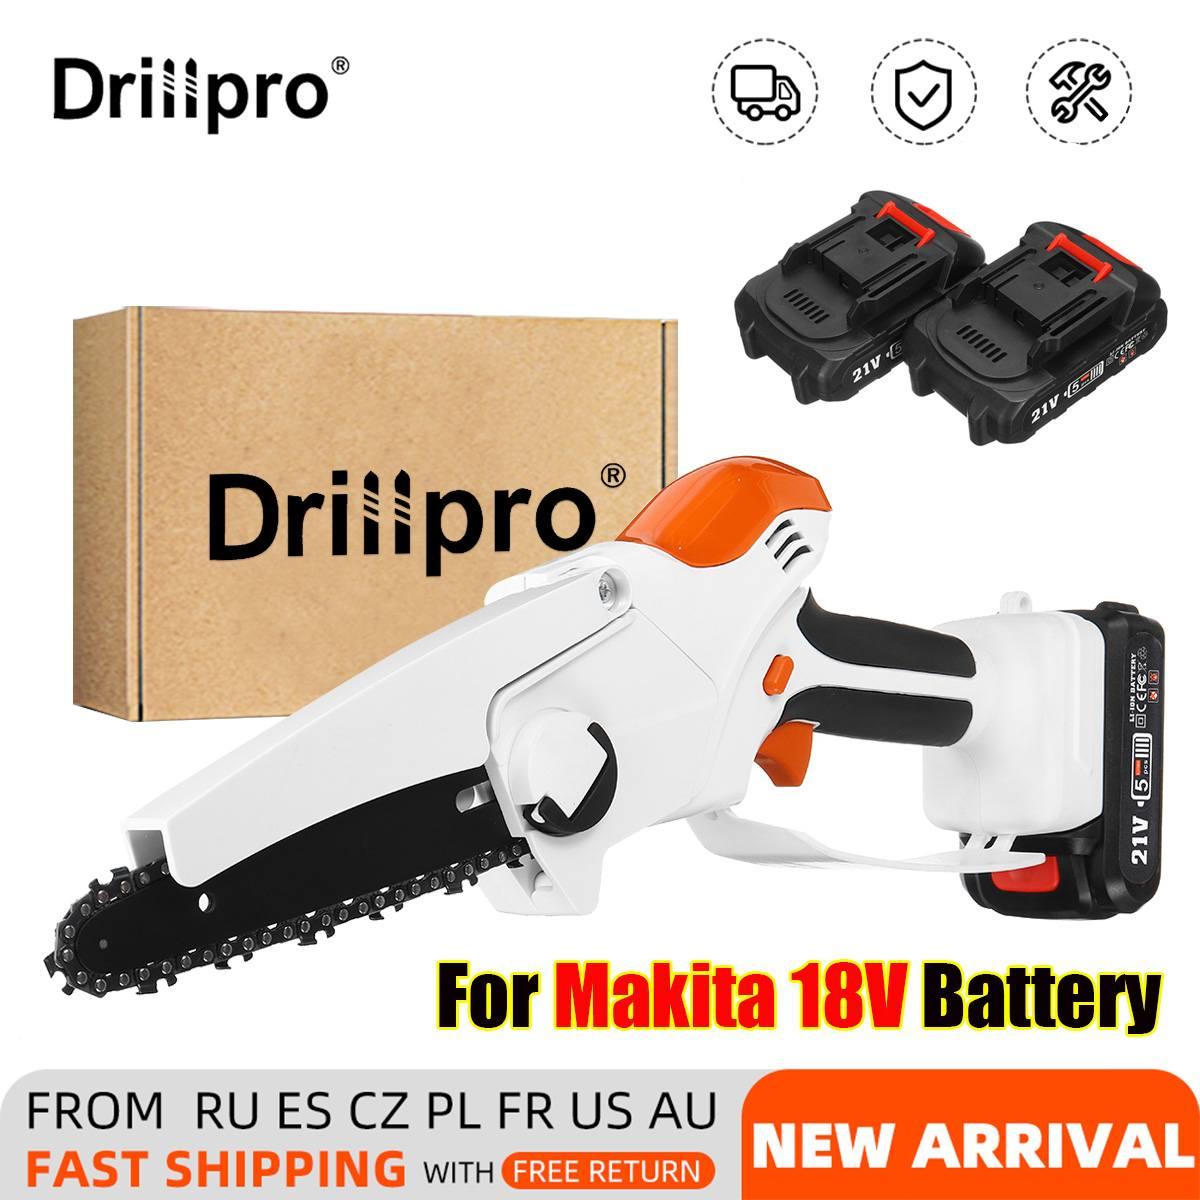 Drillpro 20000mAh 21 فولت 6 بوصة منشار كهربائي صغير قابلة للشحن بالمنشار 2 بطاريات حديقة أداة السلطة لبطارية ماكيتا 18 فولت